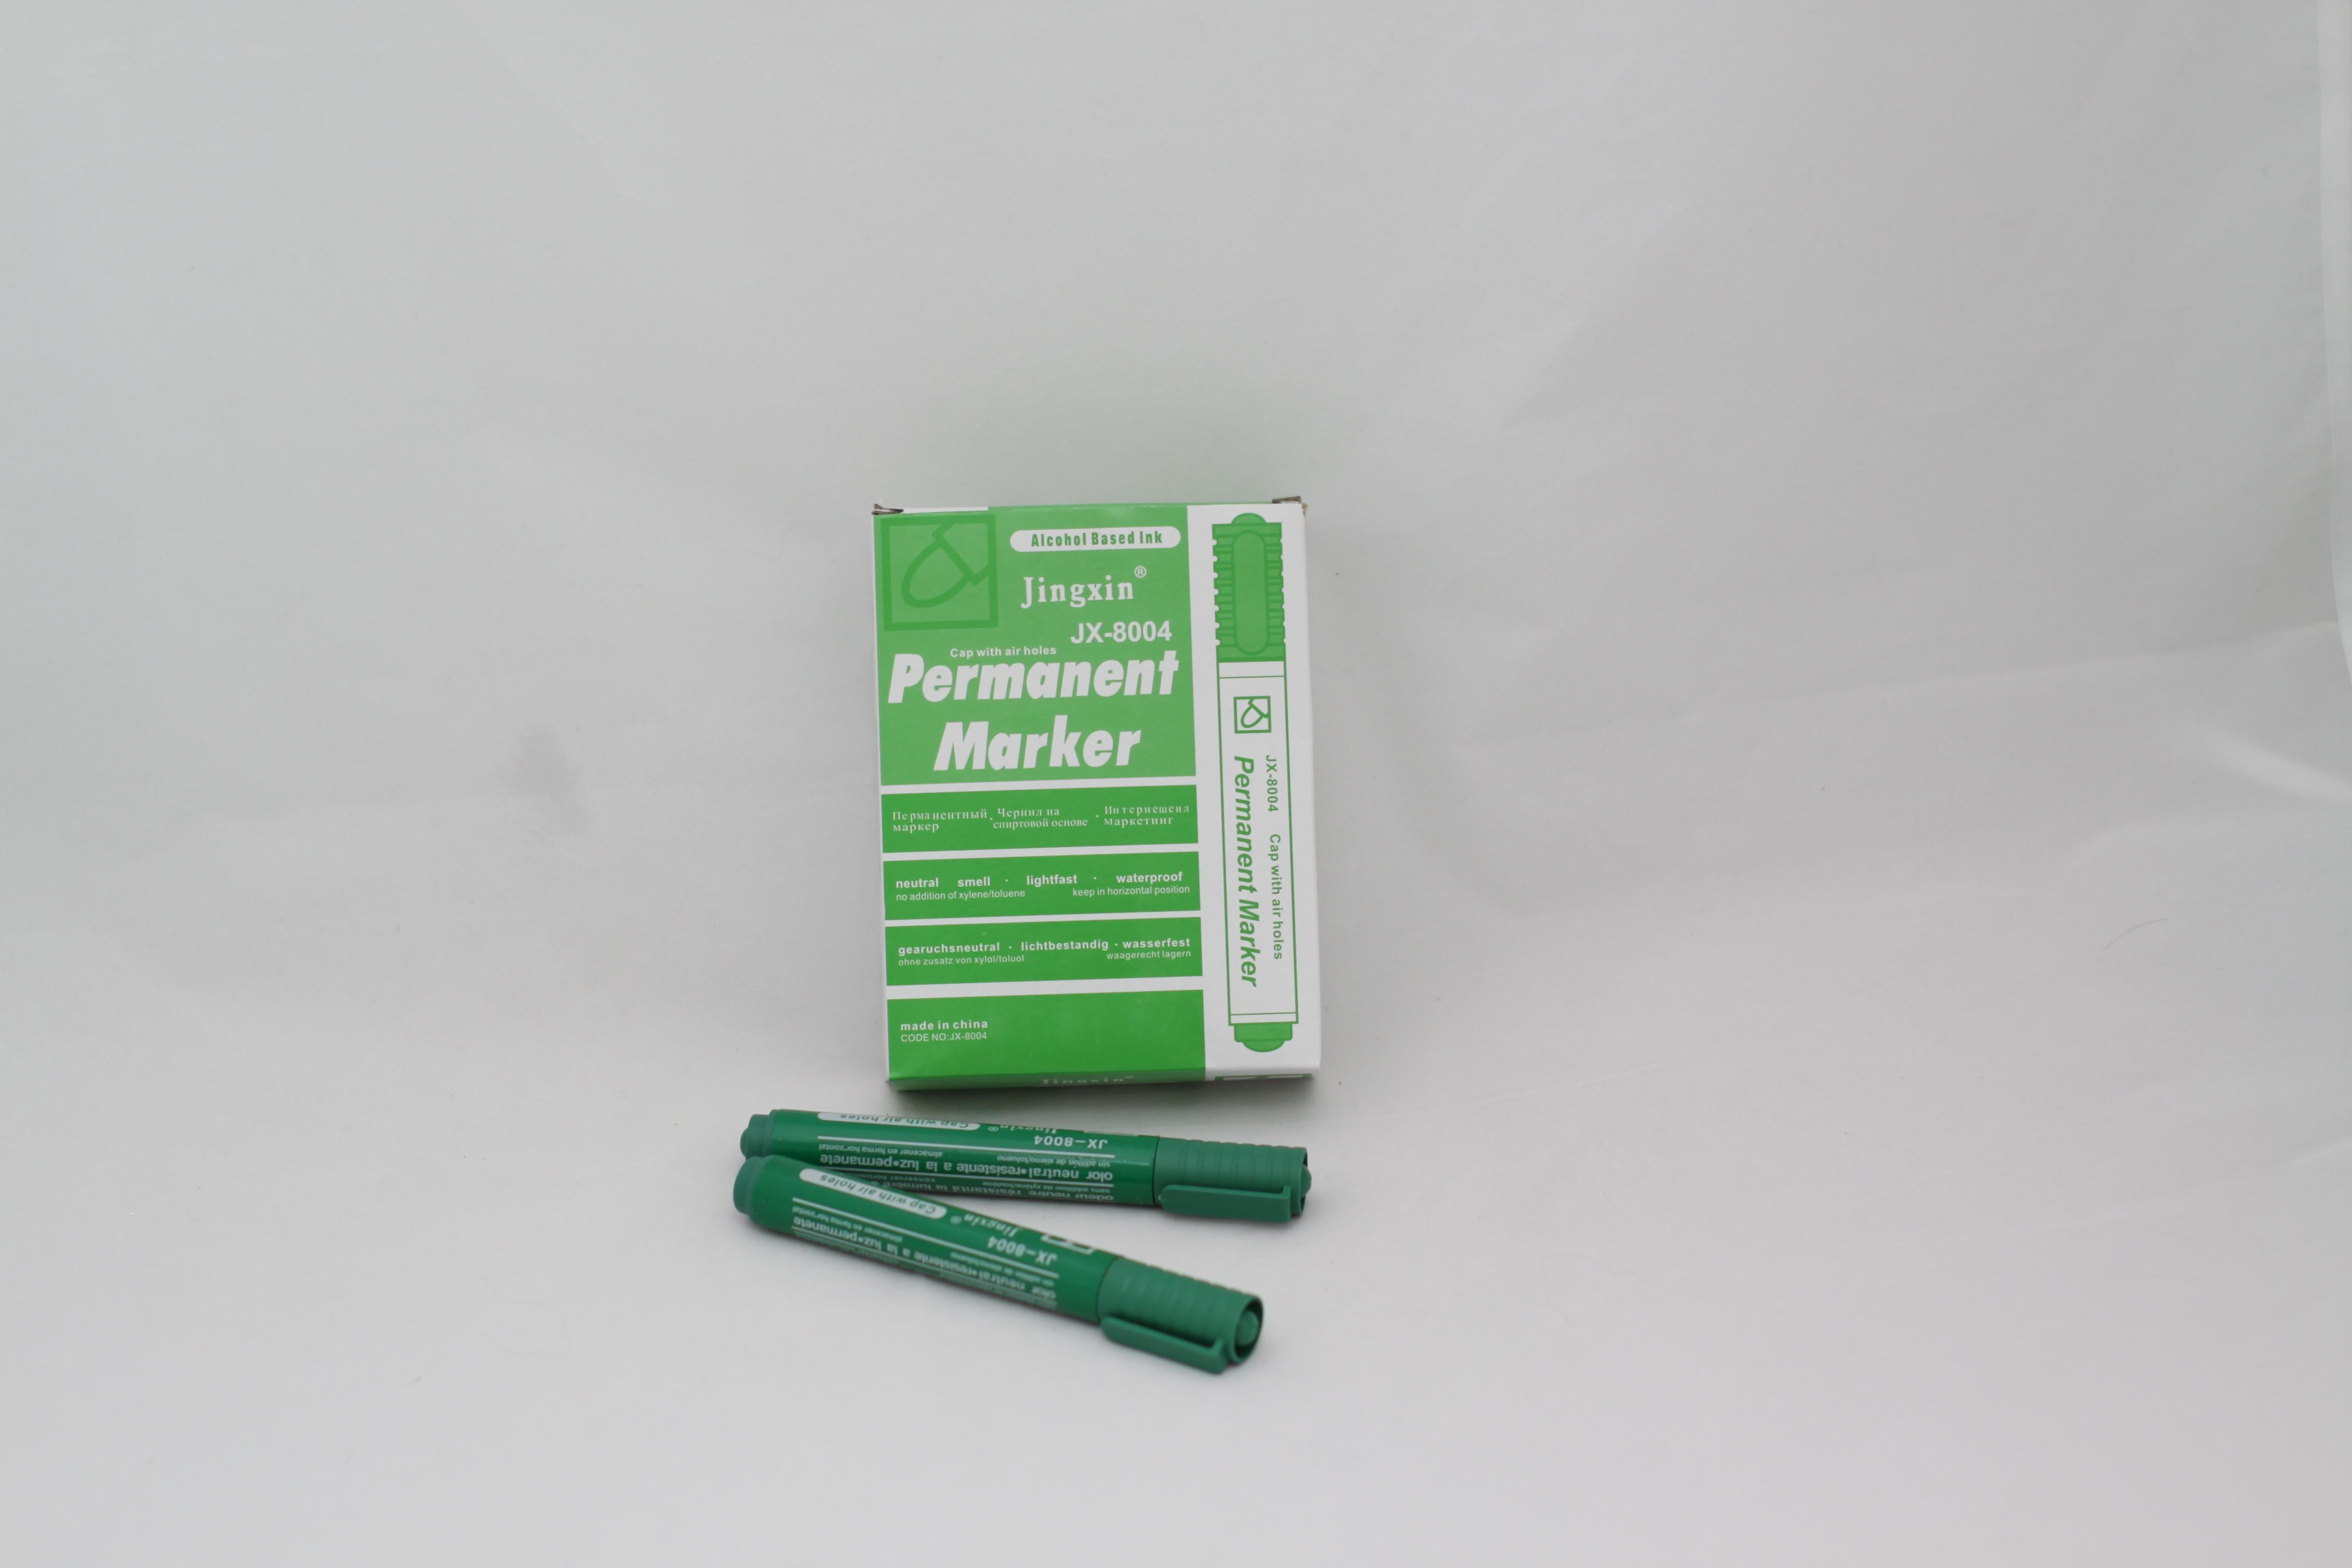 Маркер перманентный, зеленый, круглый, 2.5 мм, Jingxin